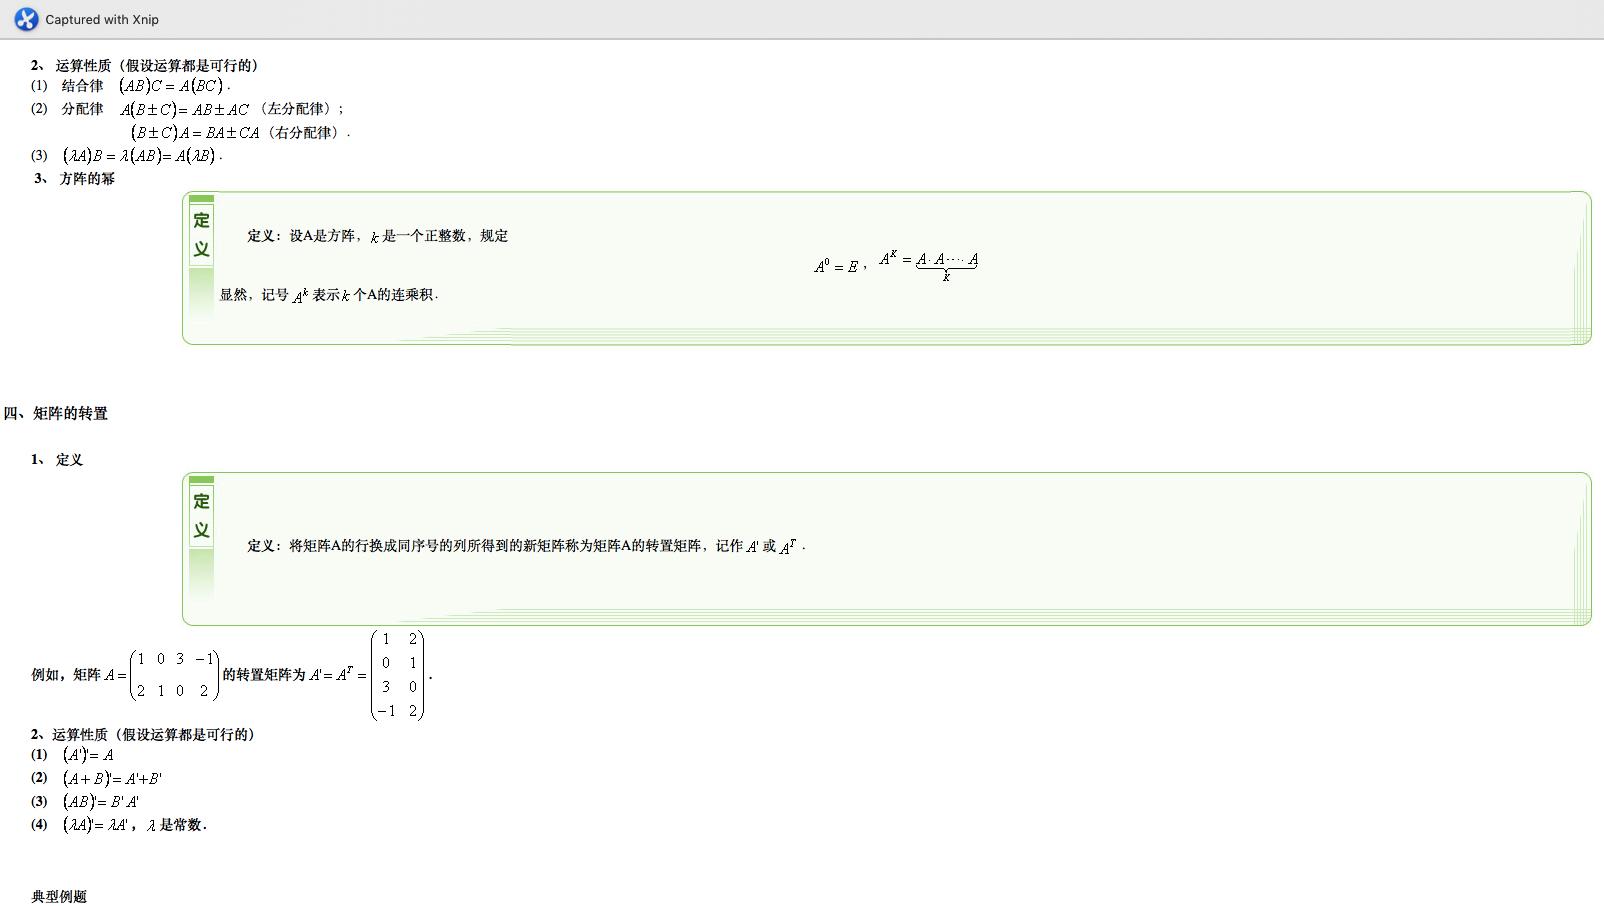 CC537BF0-150C-4C71-871C-D68DB2E5FCBE.png